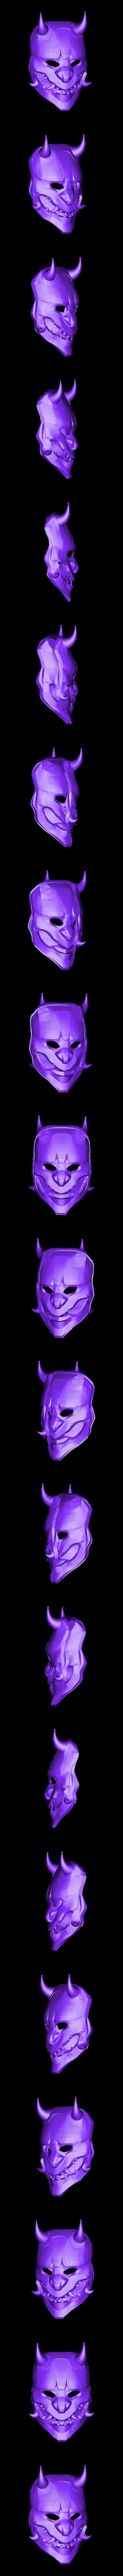 Oni_Mask_v4.stl Download free STL file Overwatch Oni Genji • 3D printable object, VillainousPropShop